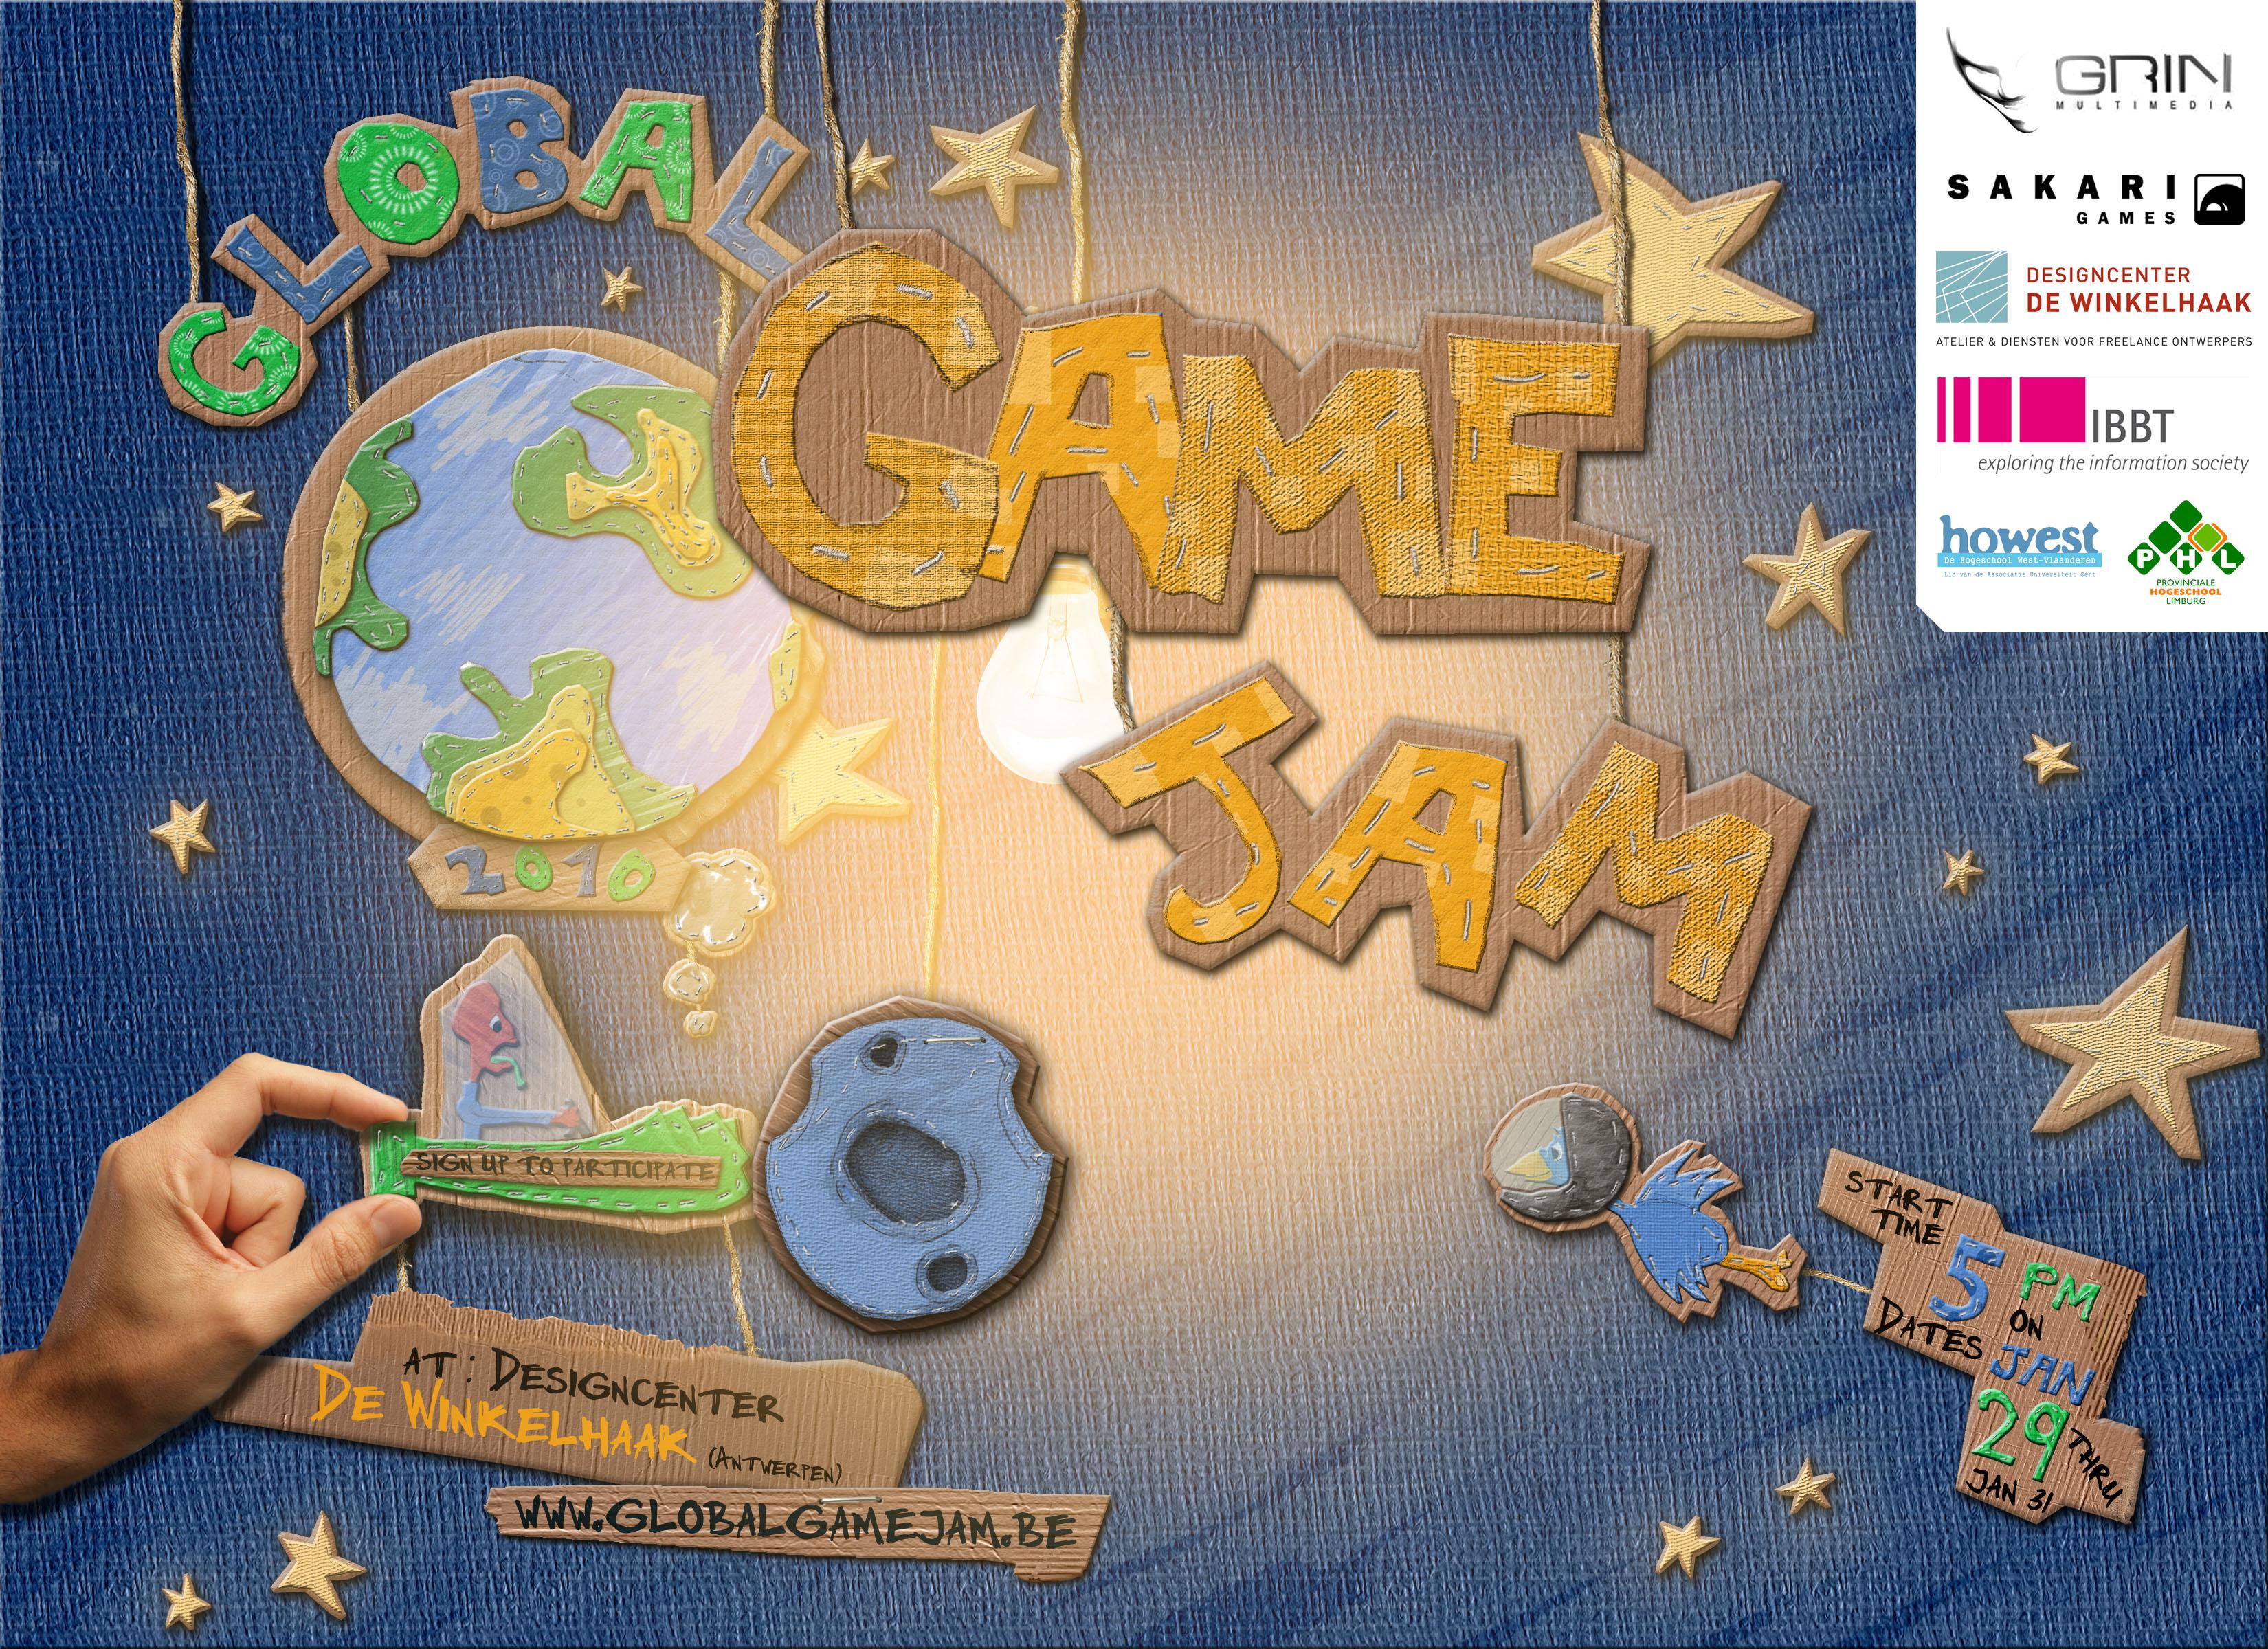 Global Game Jam 2010 Poster